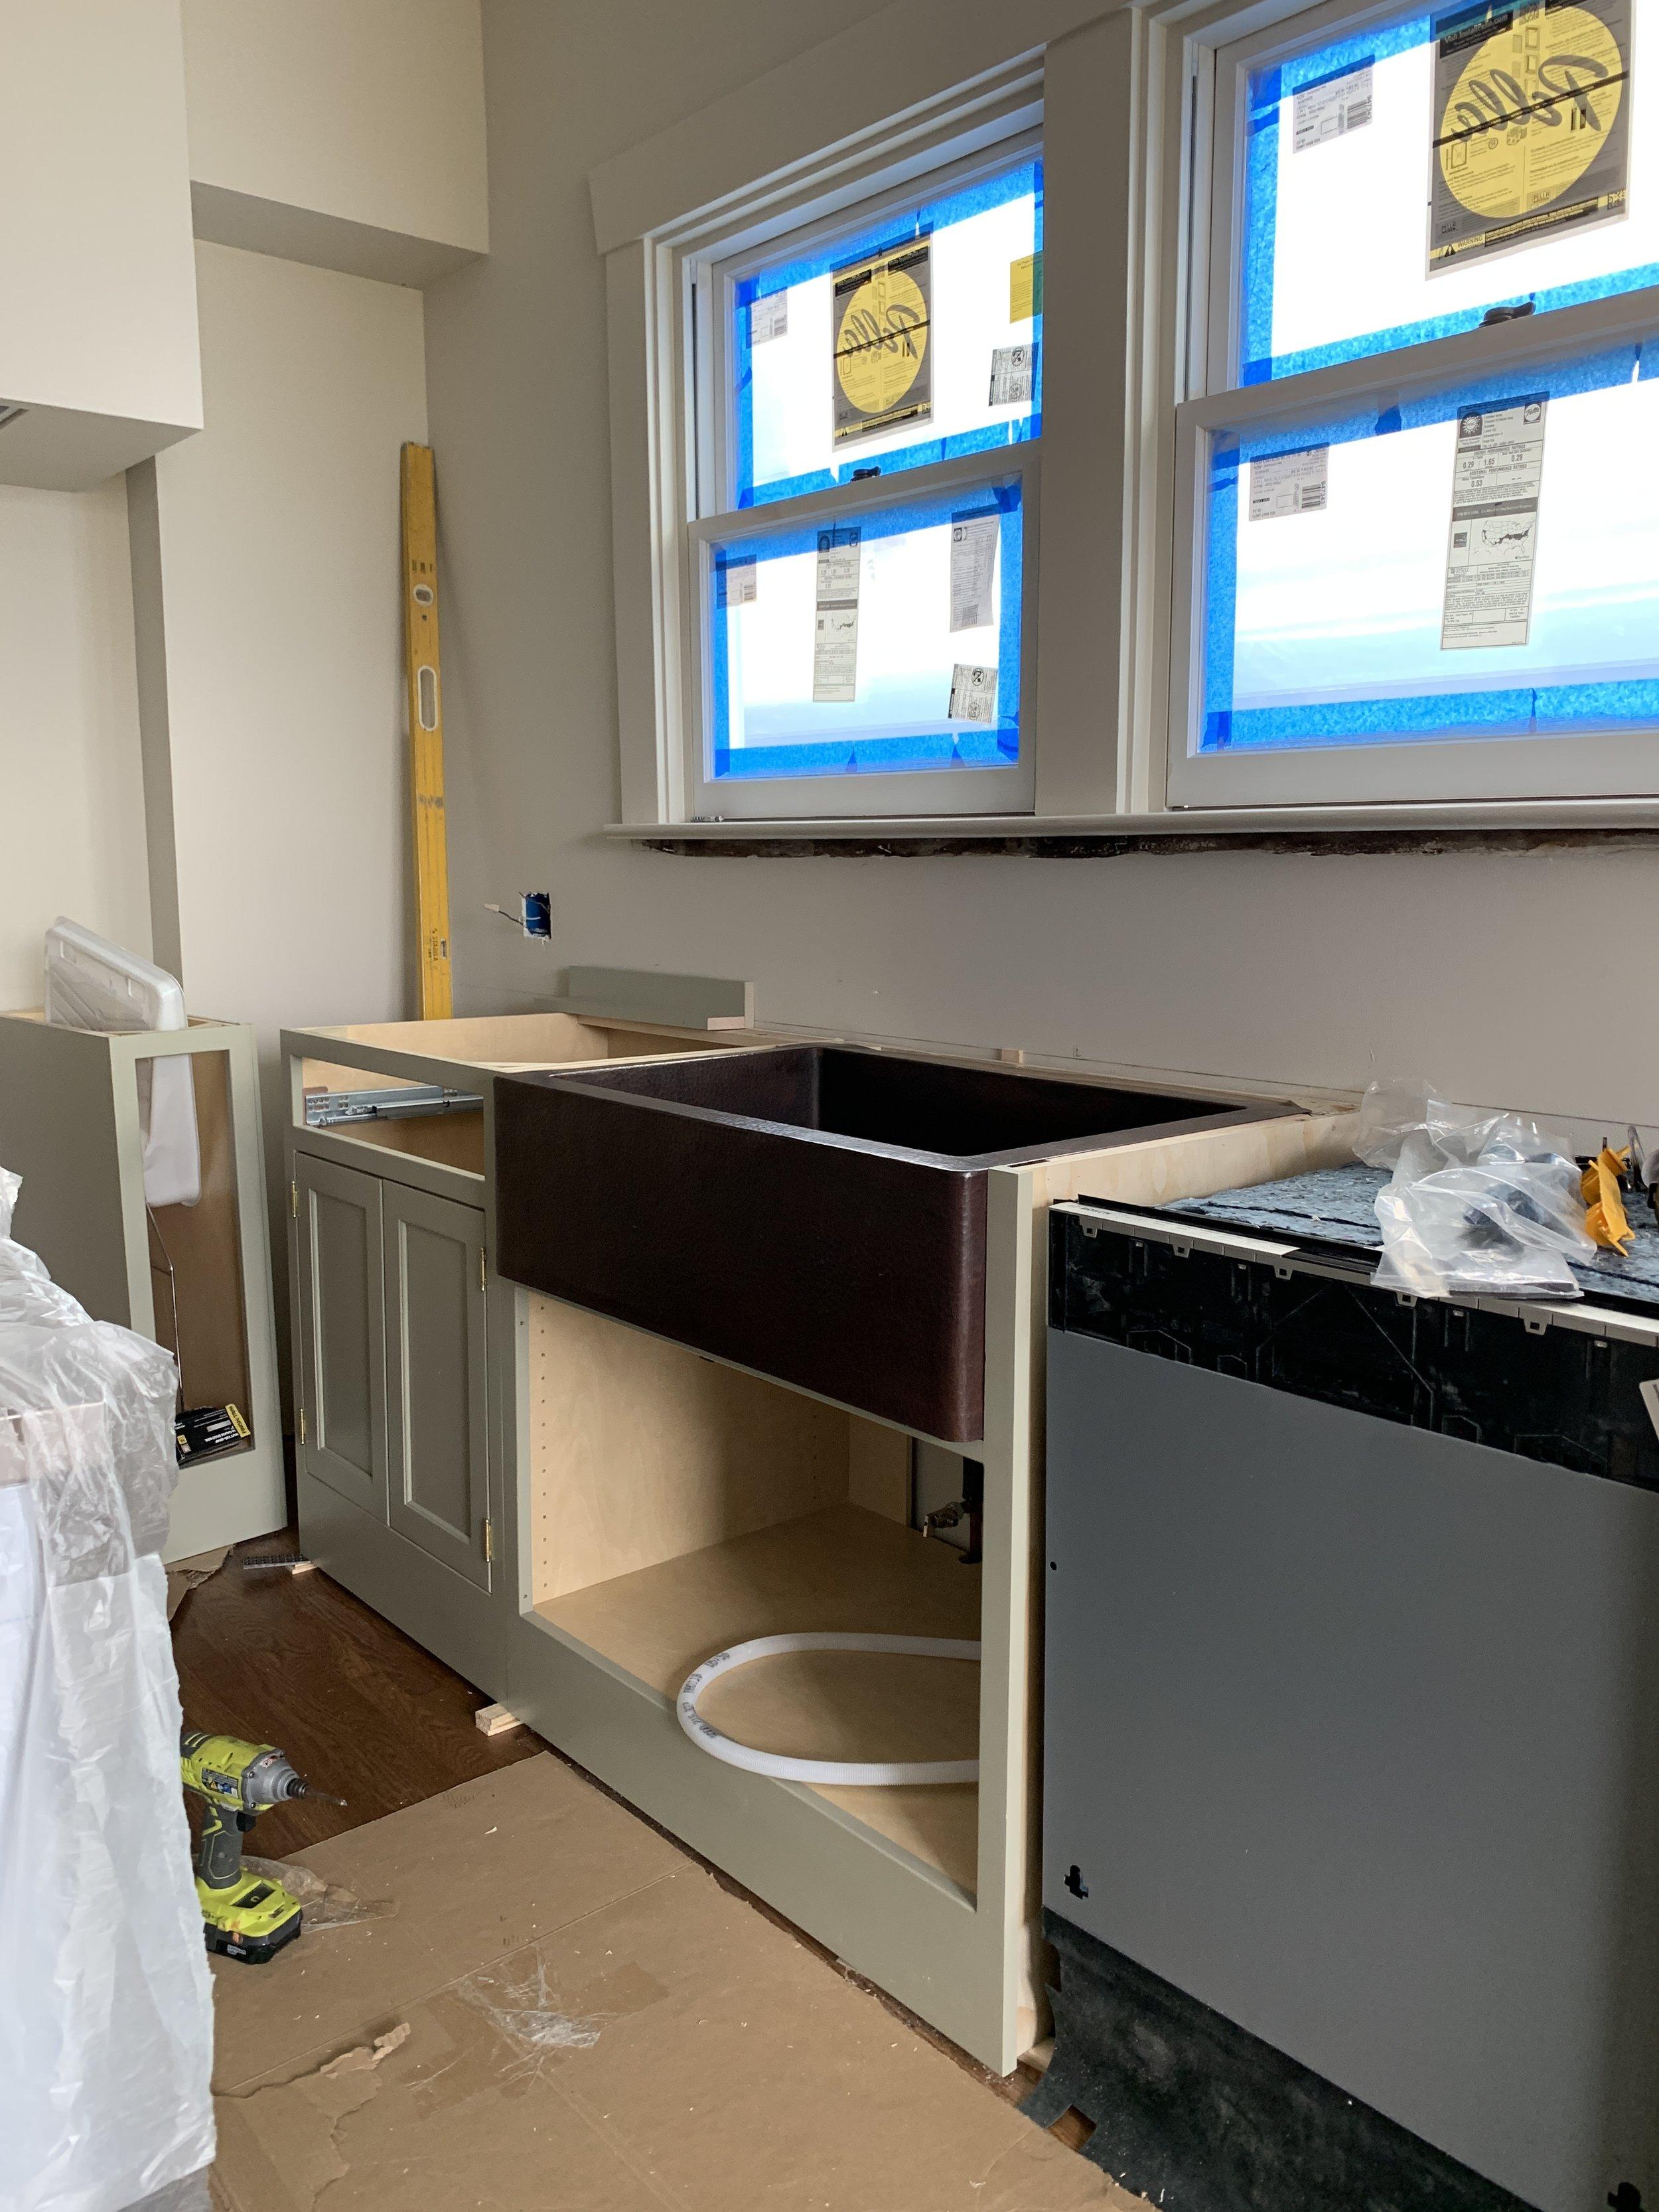 Our kitchen in progress